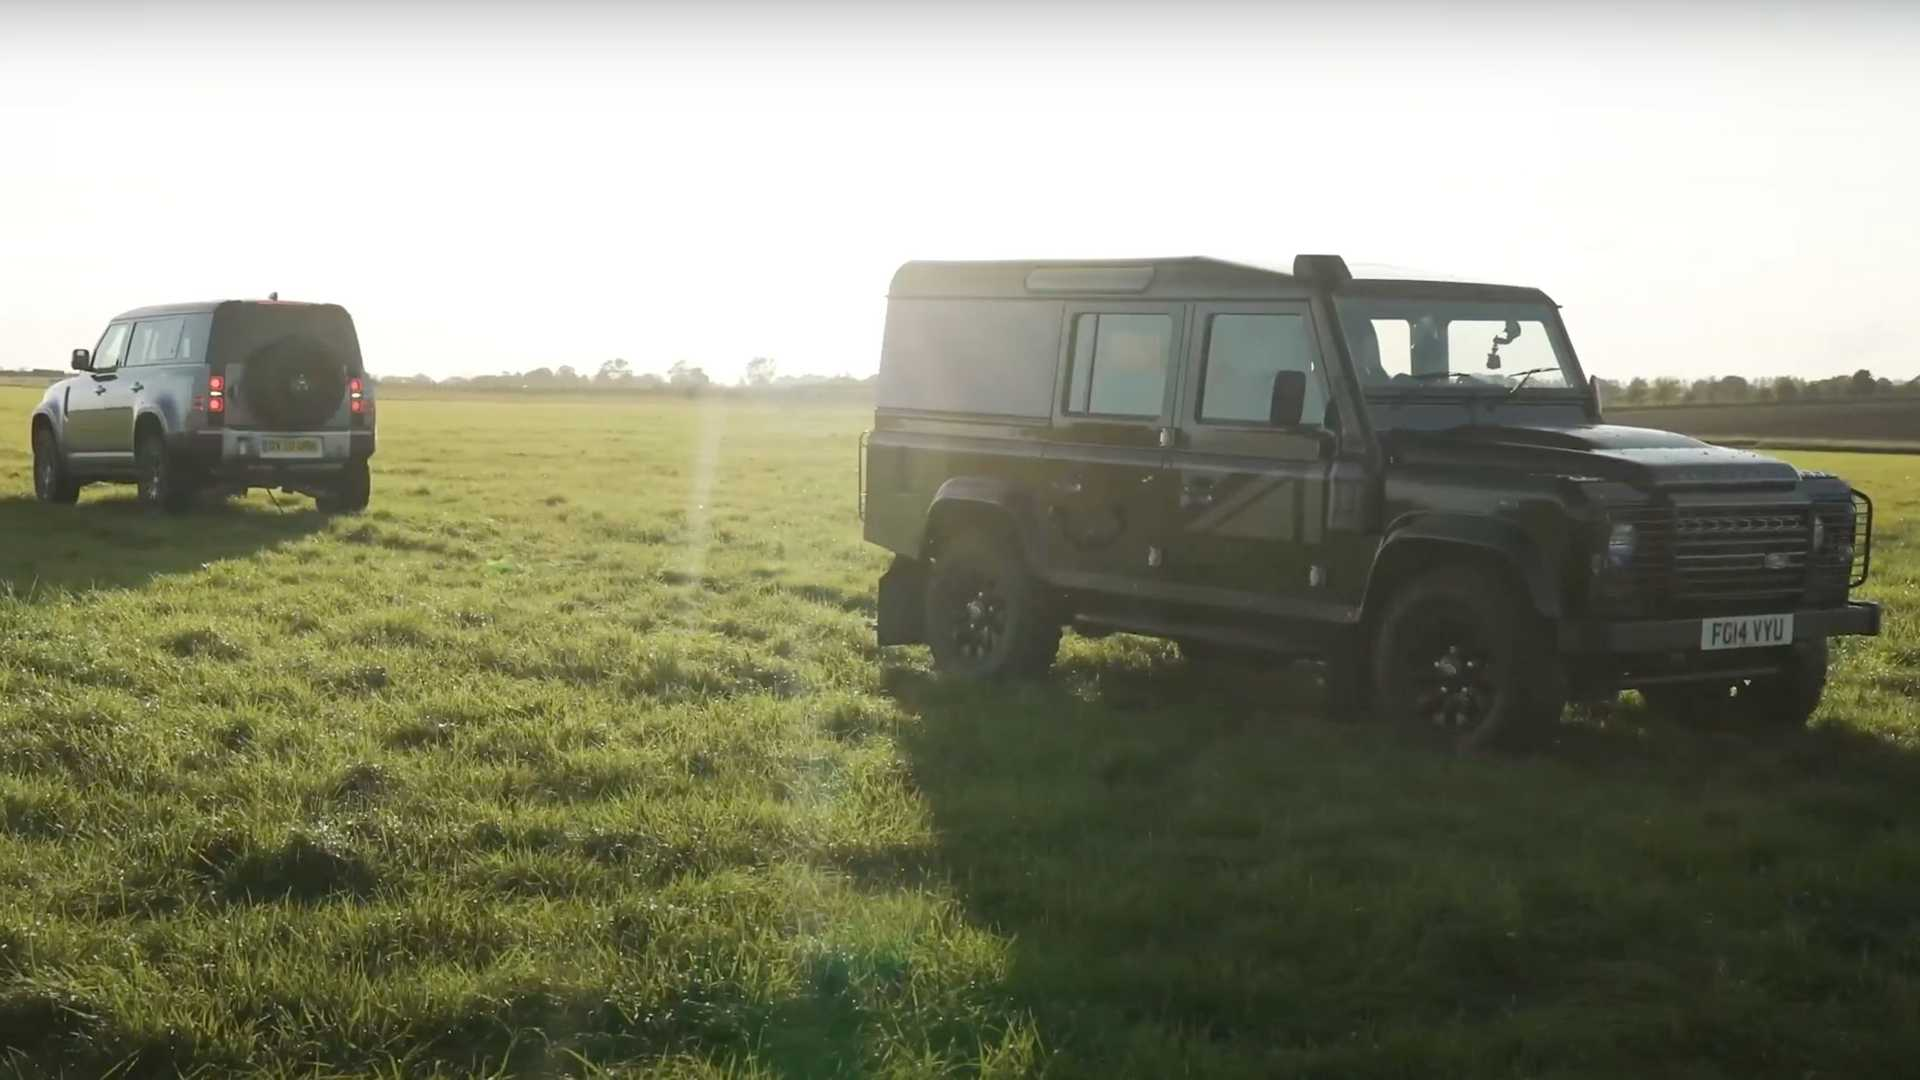 New Land Rover Defender Takes On Old Defender In Tug Of War